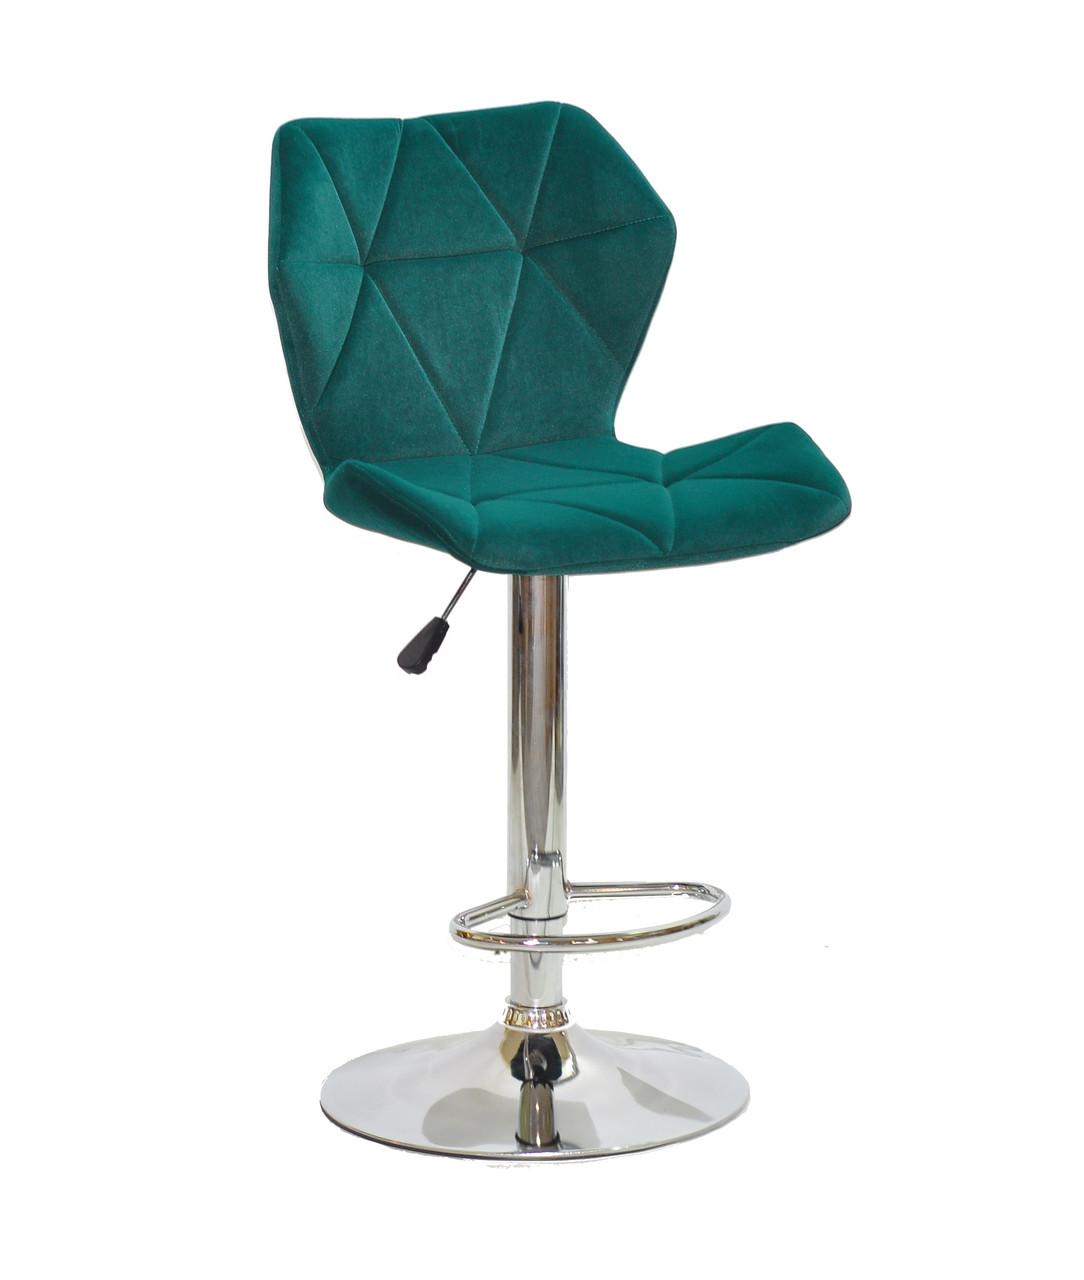 Барный стул Торино TORINO BAR зеленый бархат